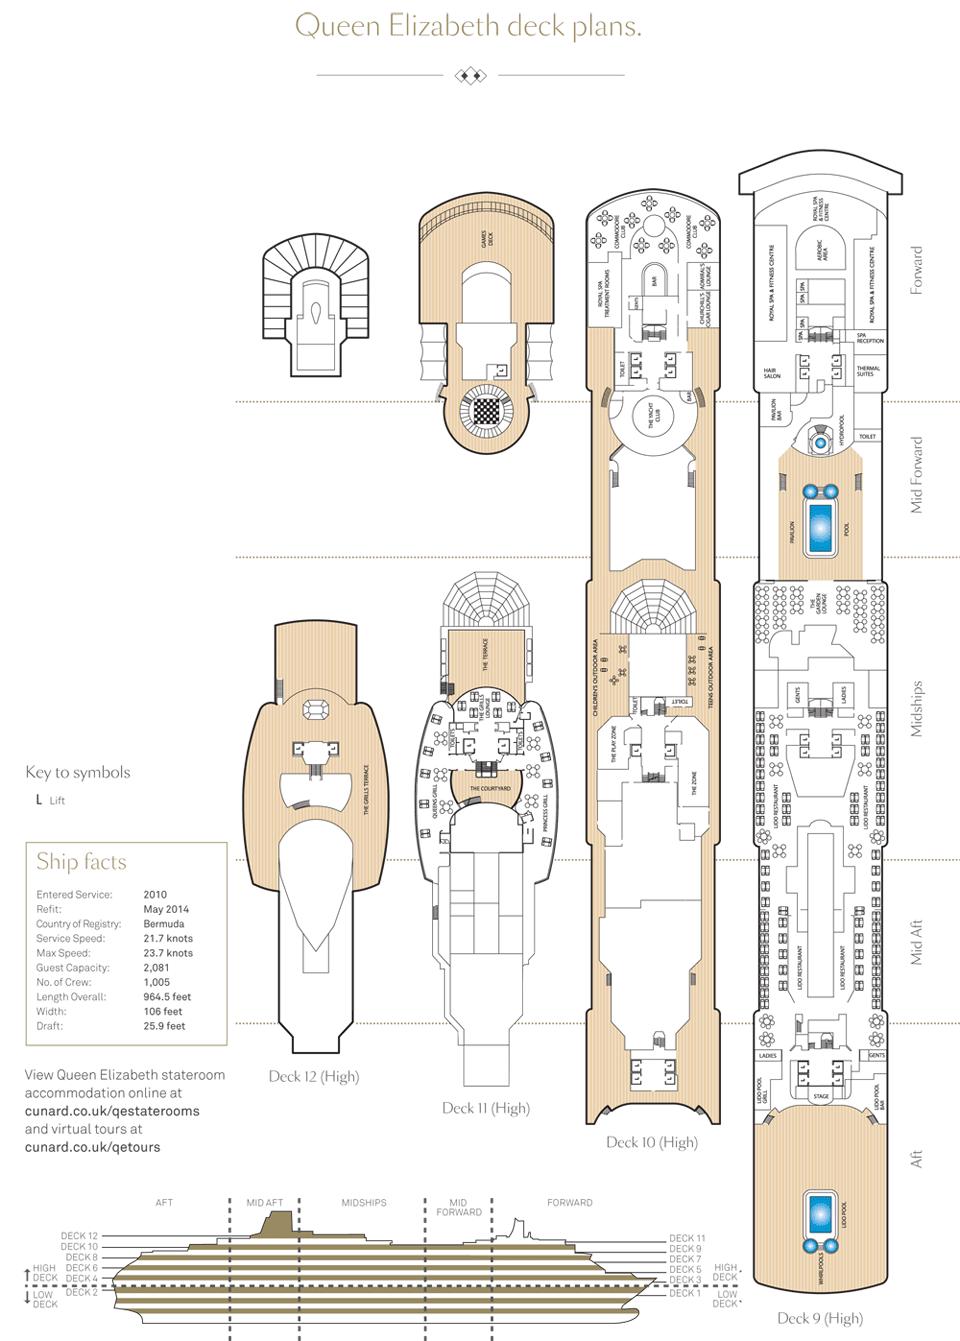 Cunard download deck plan queen elizabeth in pdf baanklon Gallery